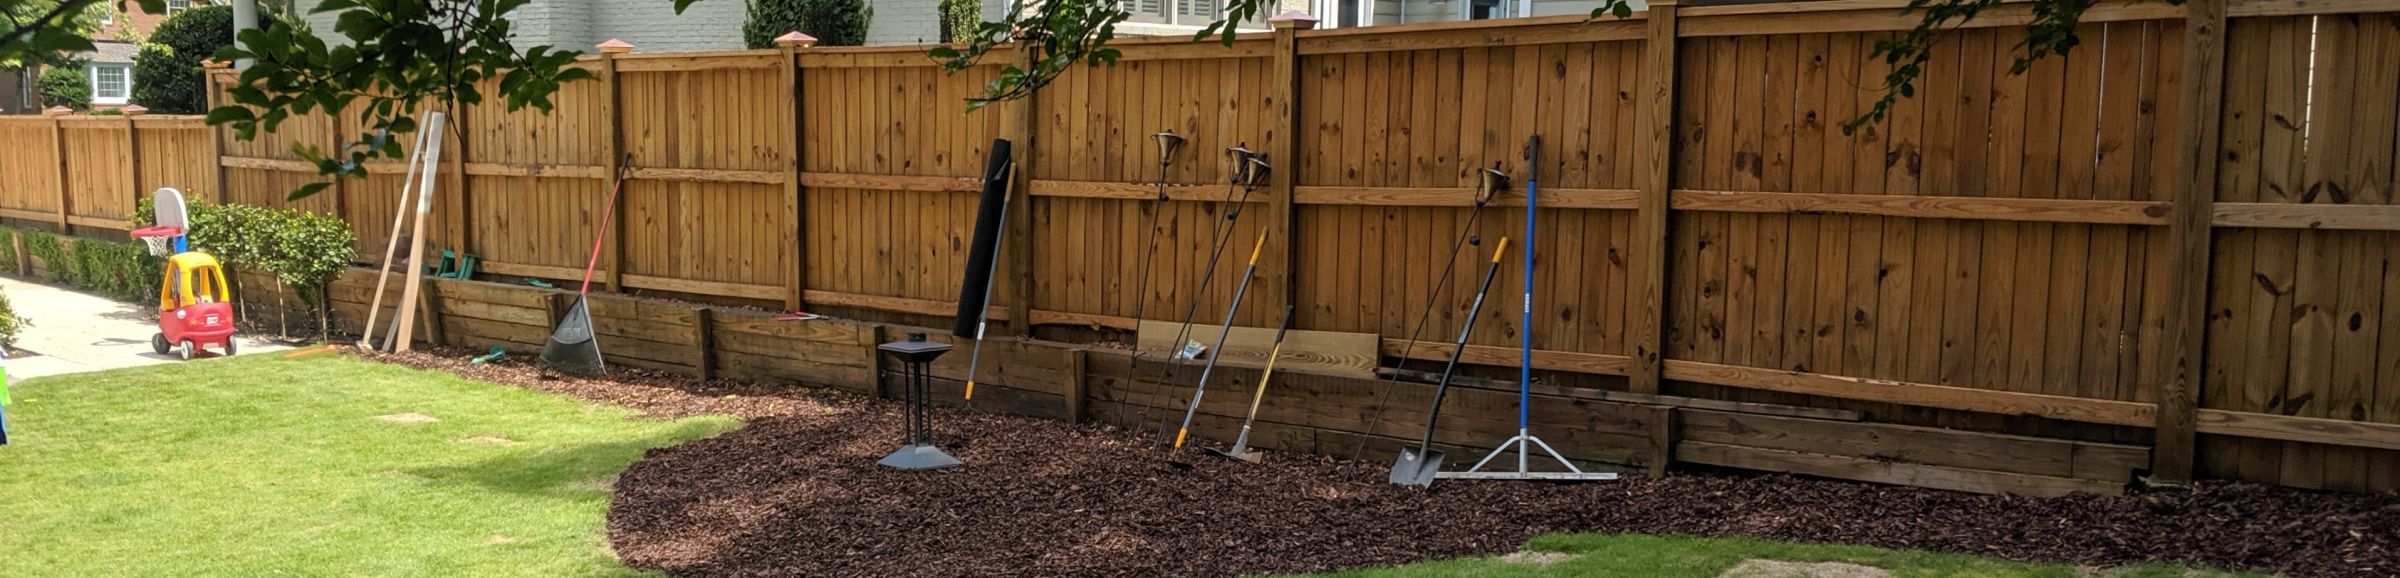 Timber retaining wall repair help-mvimg_20190611_152626.jpg